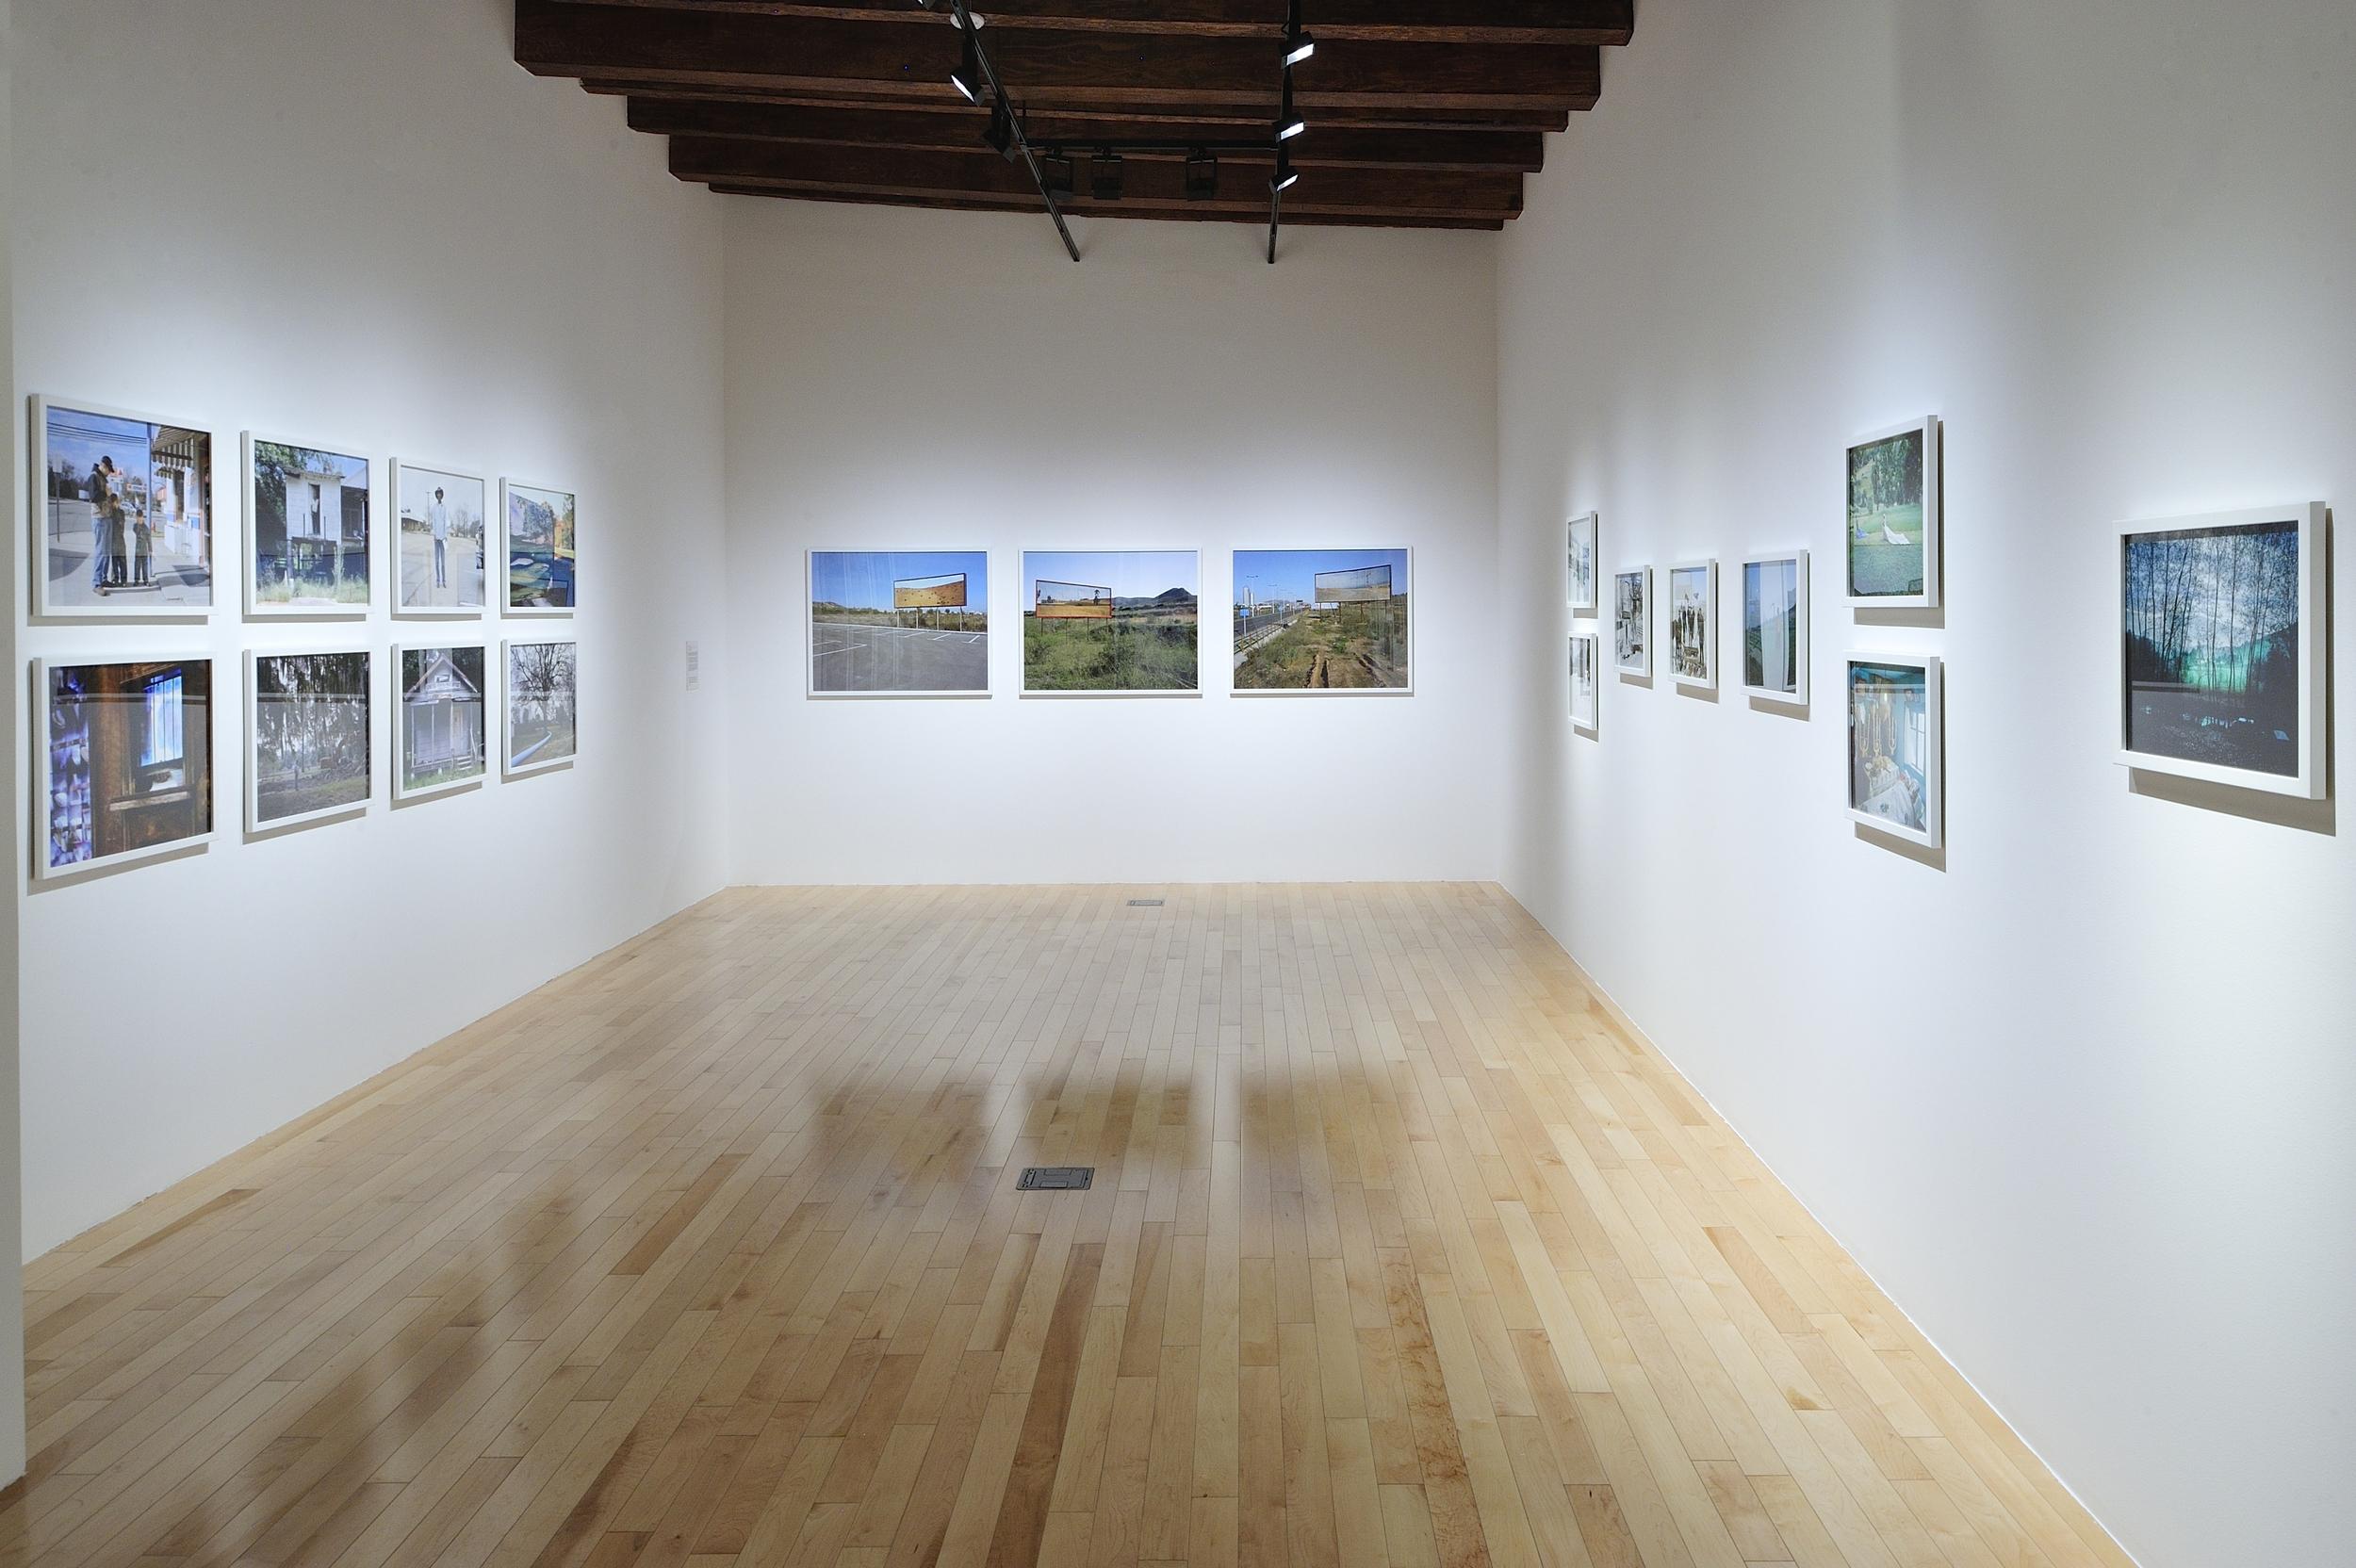 RG3_Museo Amparo_Puebla_MX_1_023.JPG